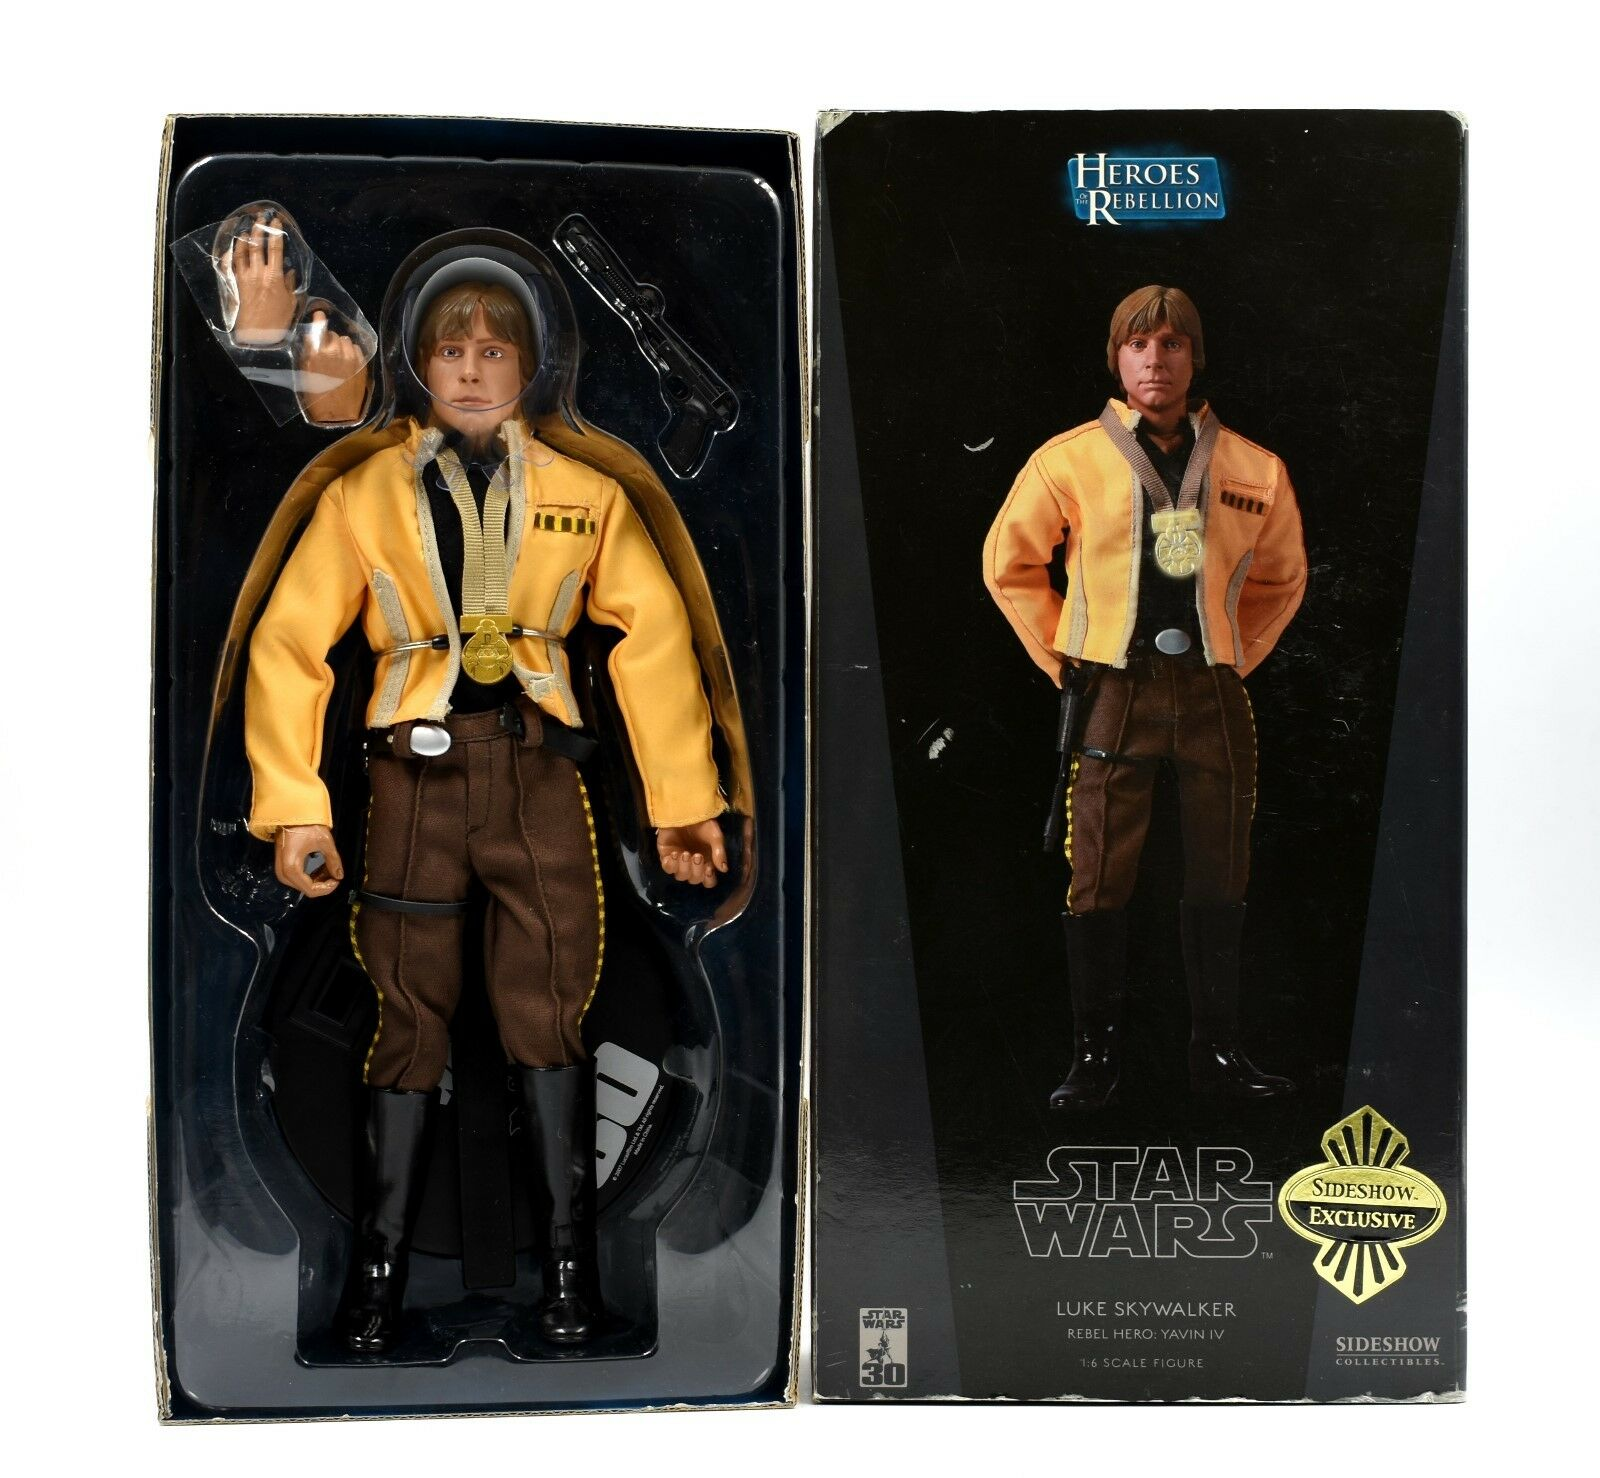 Sideshow Exclusive Star Wars Heroes of The Rebellion - 1:6 Scale Luke Skywalker